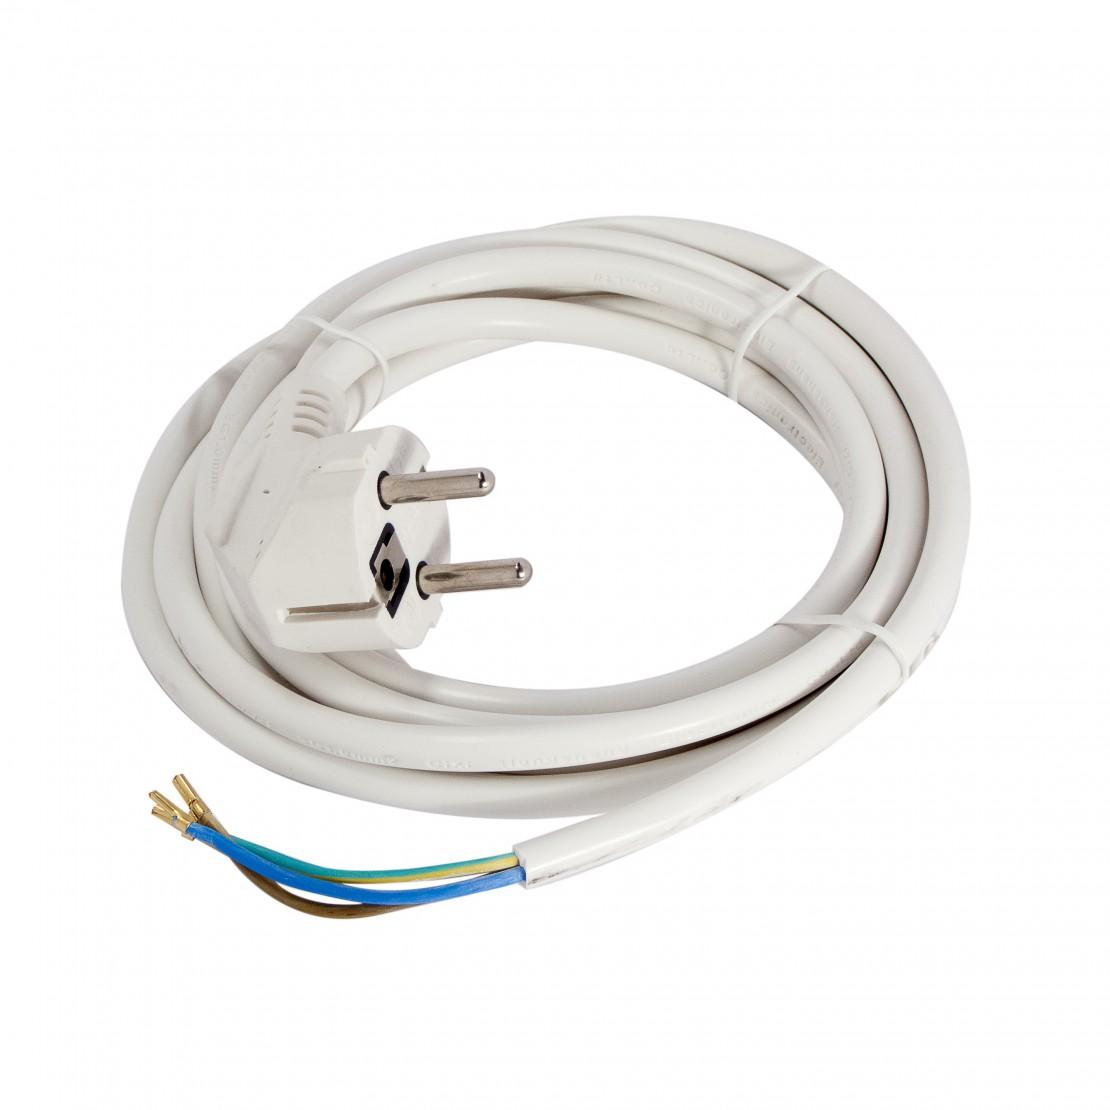 Aansluitsnoer HO5VV-F - 1,5m 3x 1,0mm2- wit